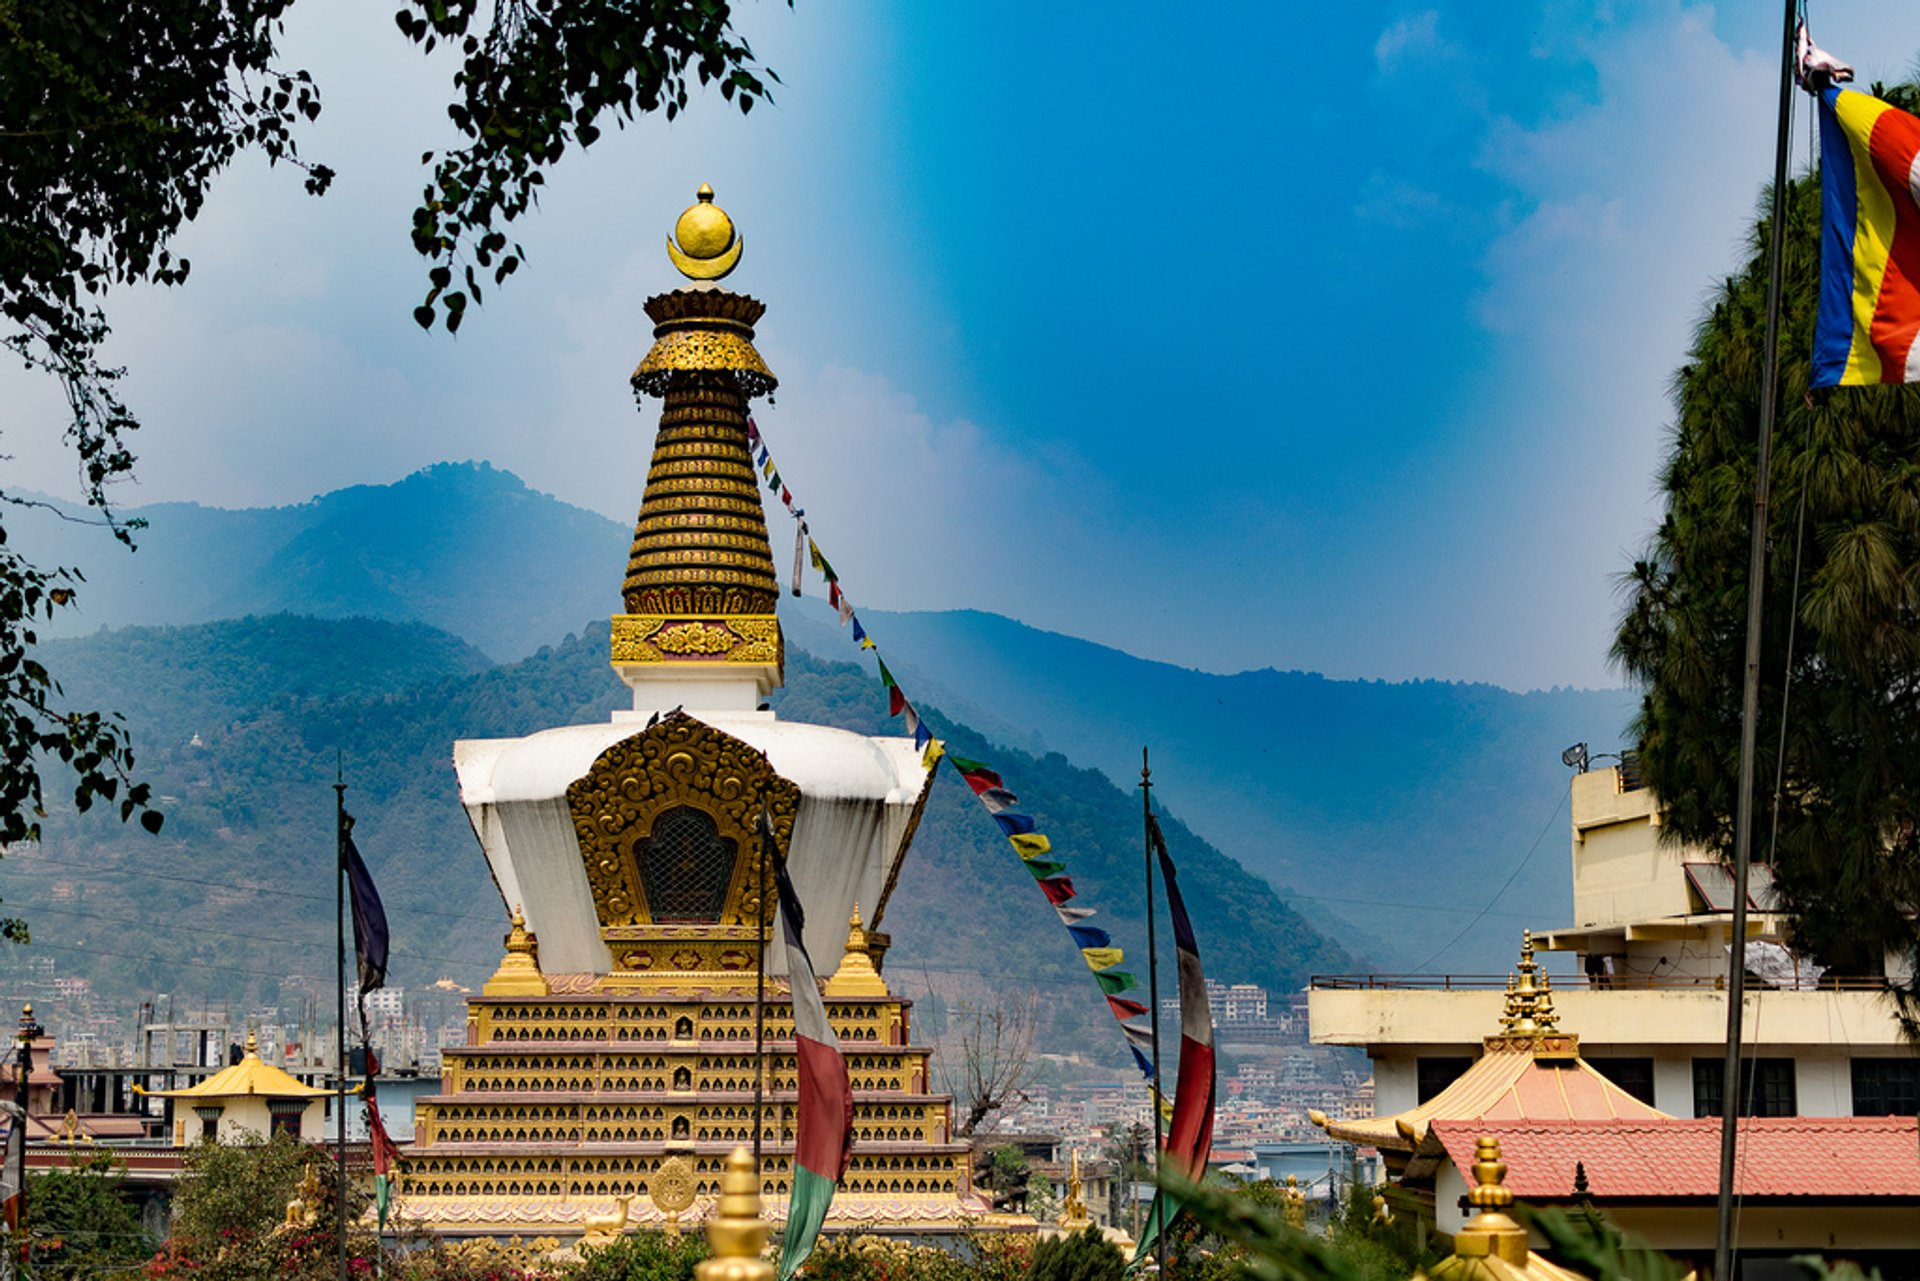 Best time for Swayambhunath (Monkey Temple) in Kathmandu 2020